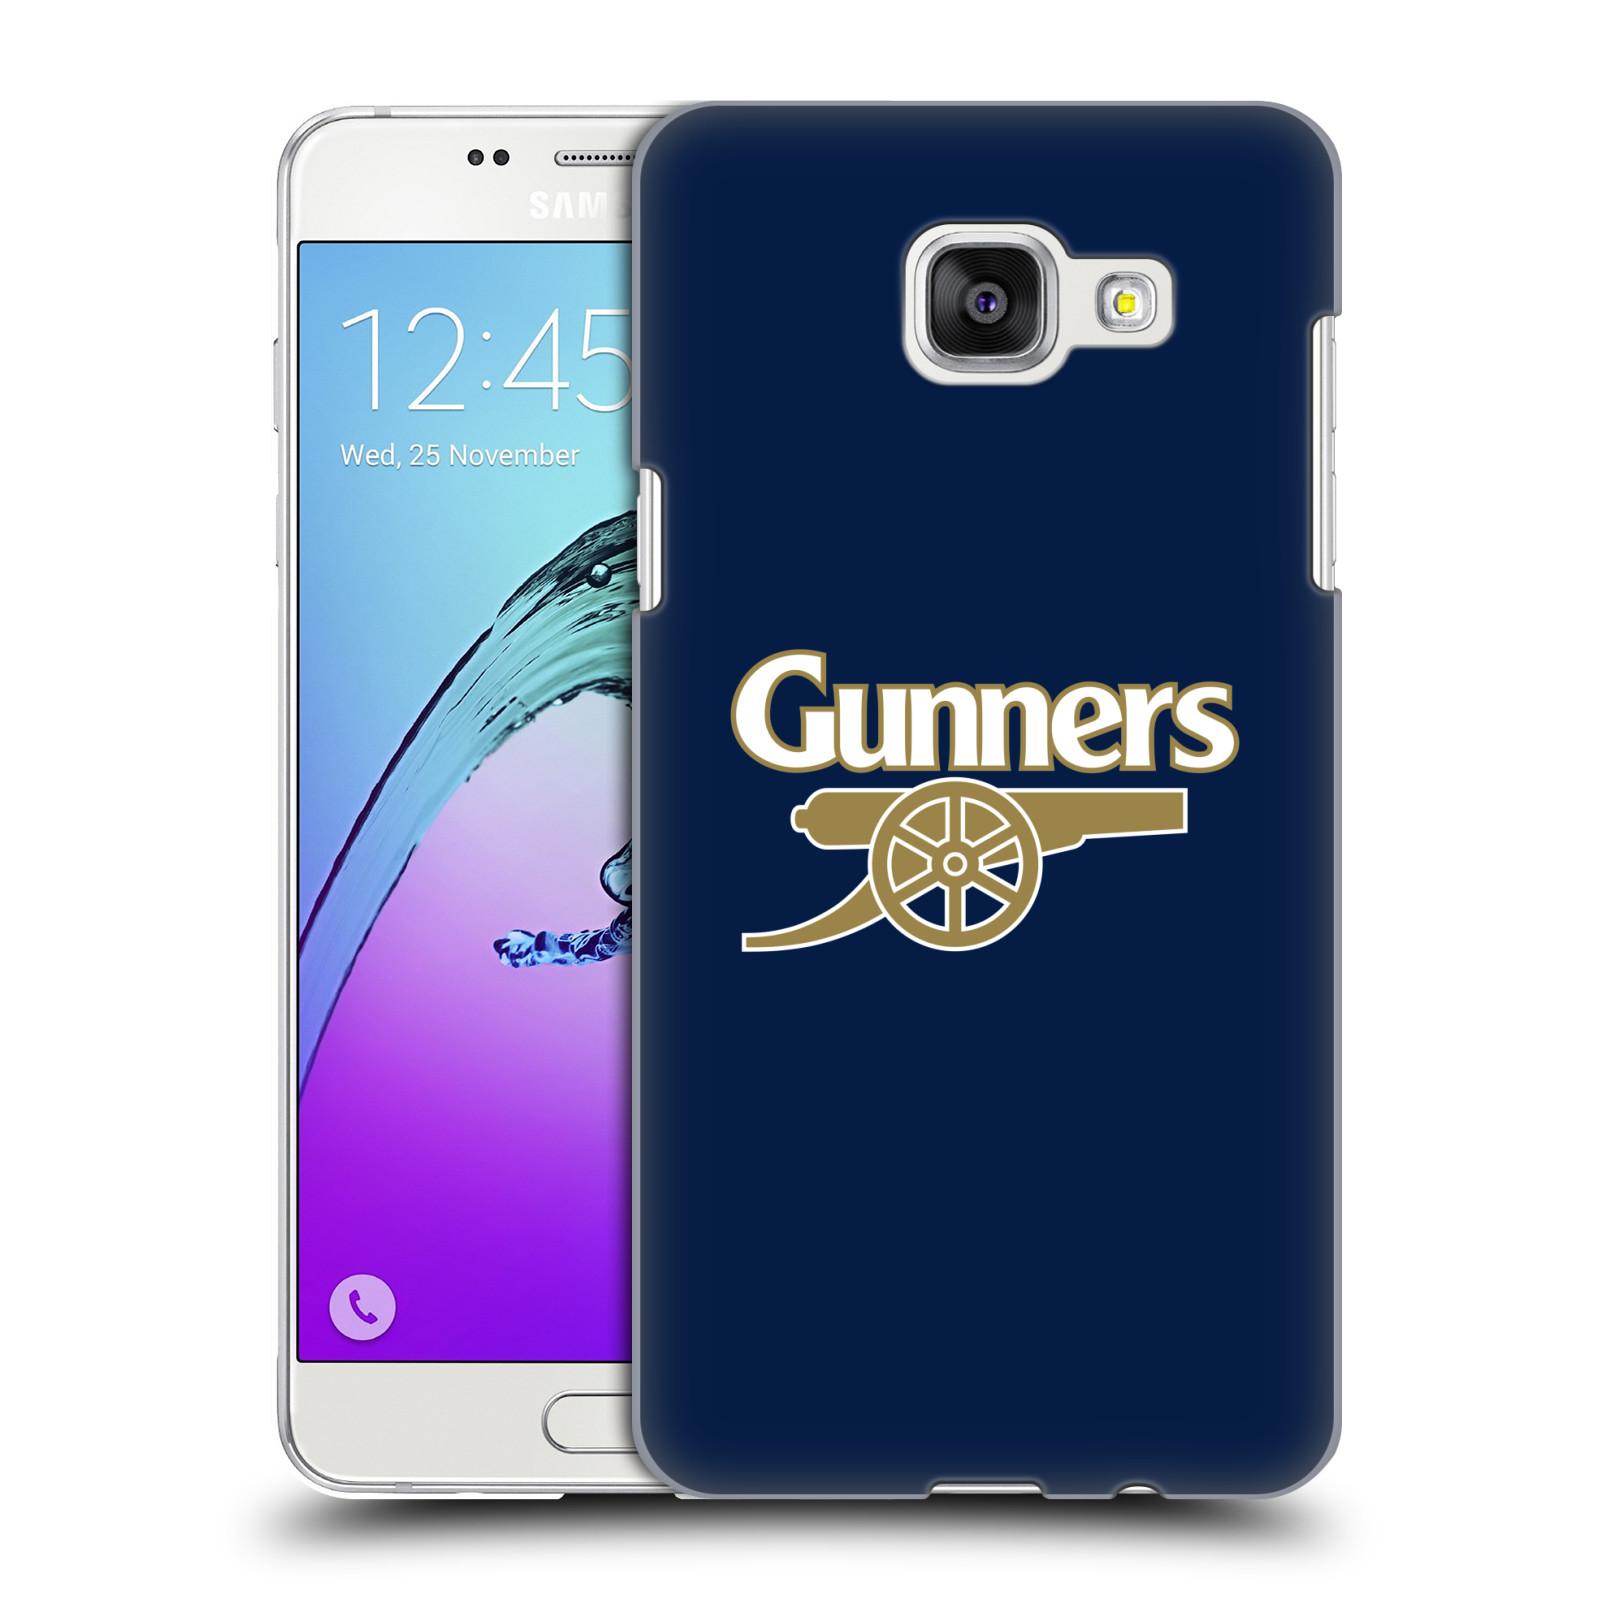 Plastové pouzdro na mobil Samsung Galaxy A5 (2016) - Head Case - Arsenal FC - Gunners